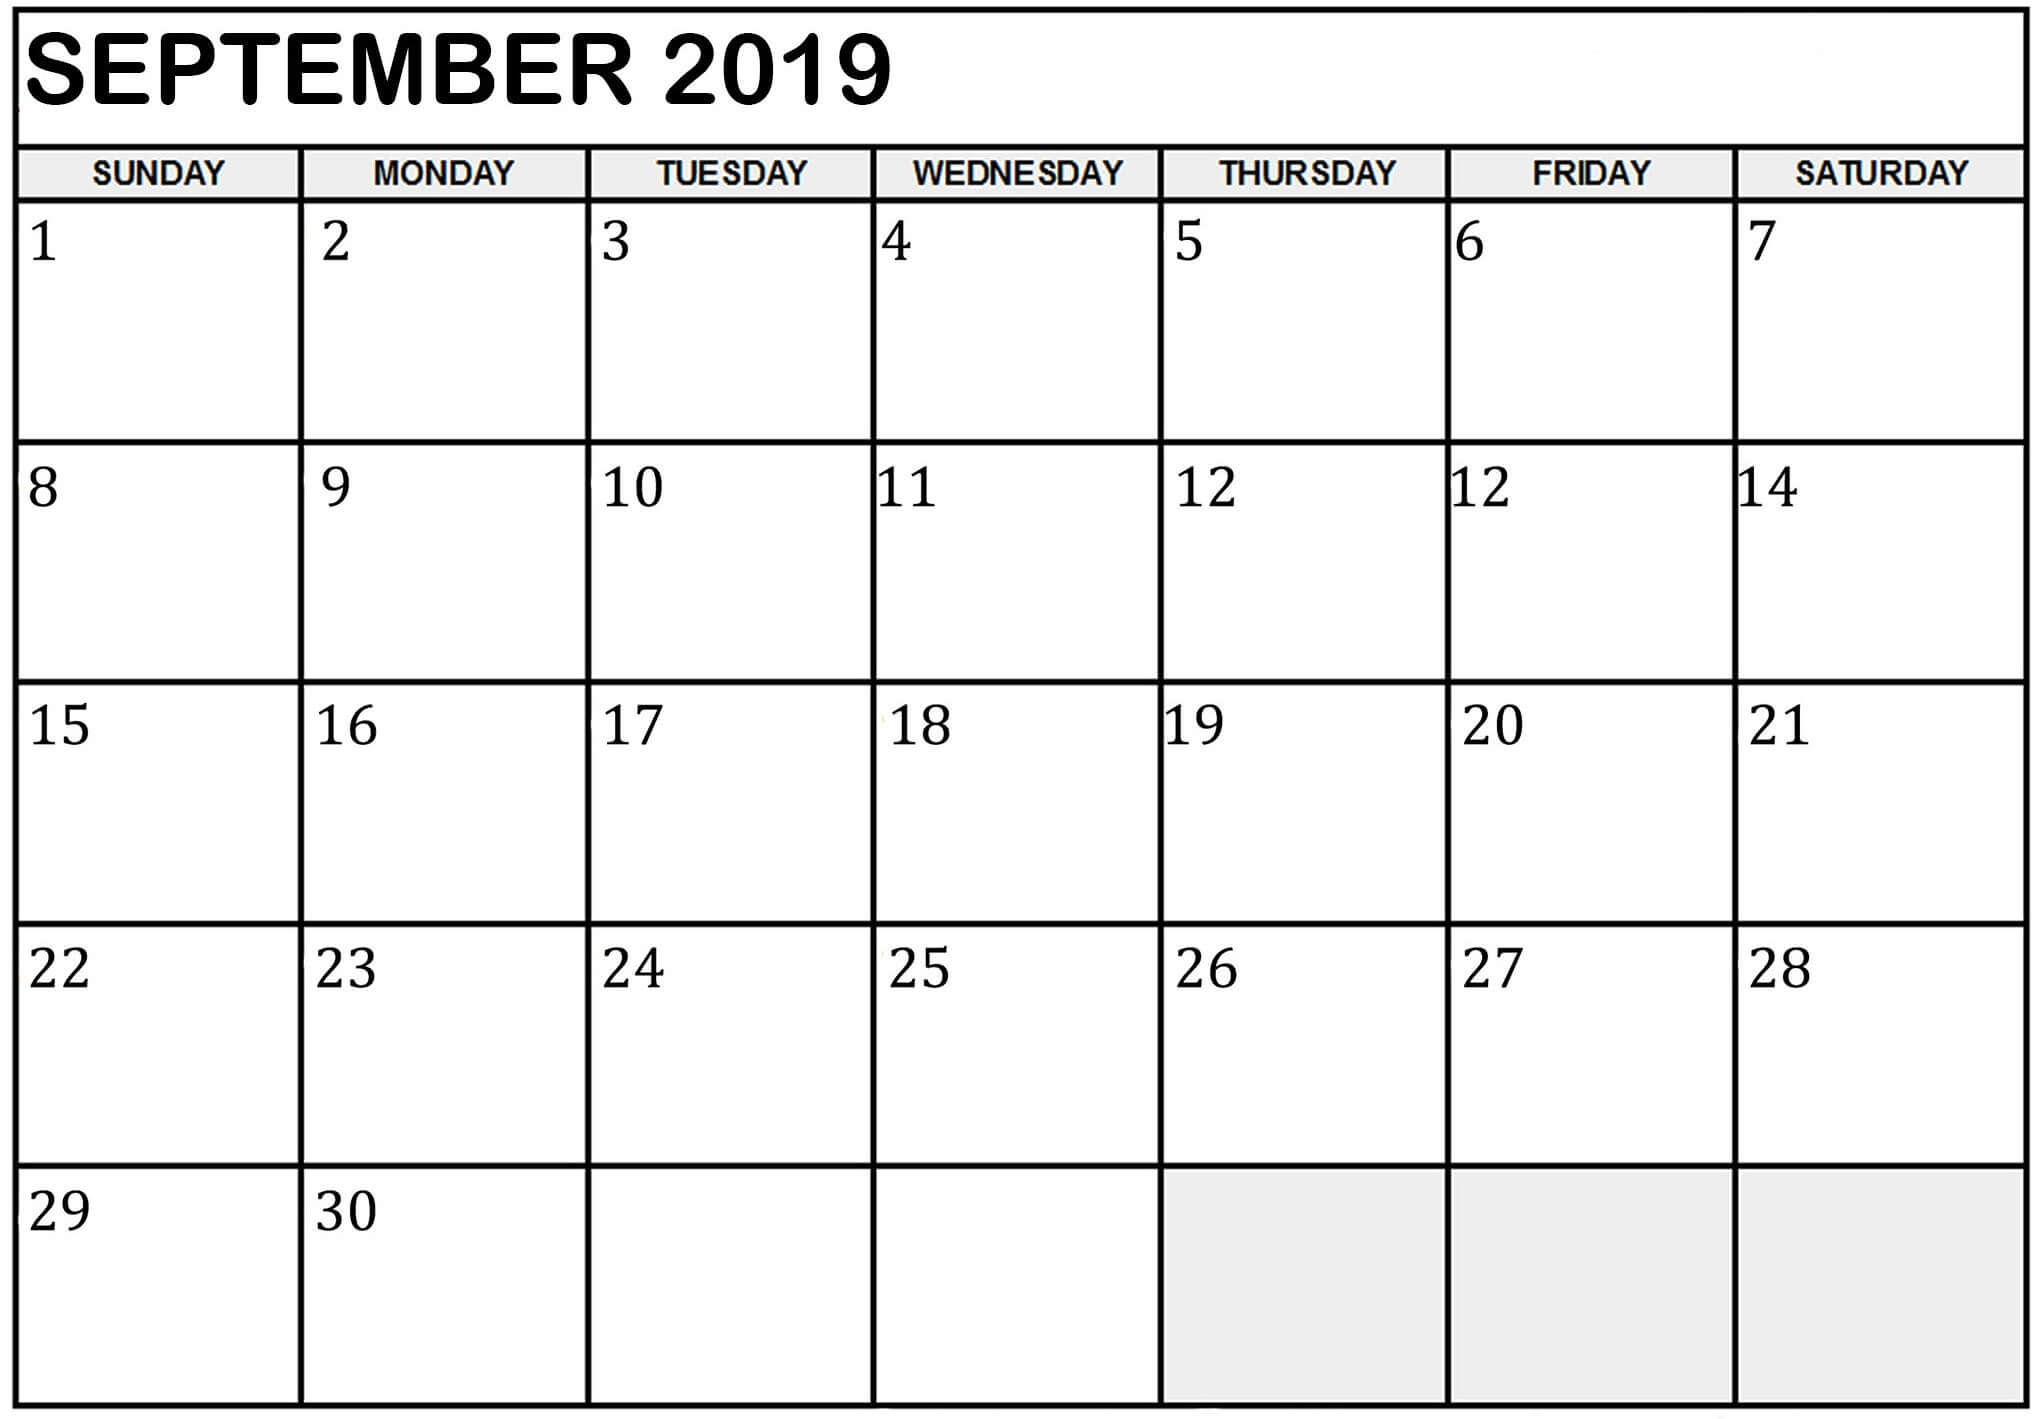 Blank Calendar September 2019   Free Printable Calendar Shop for Free Printable September Blank Calendars With Christian Themes